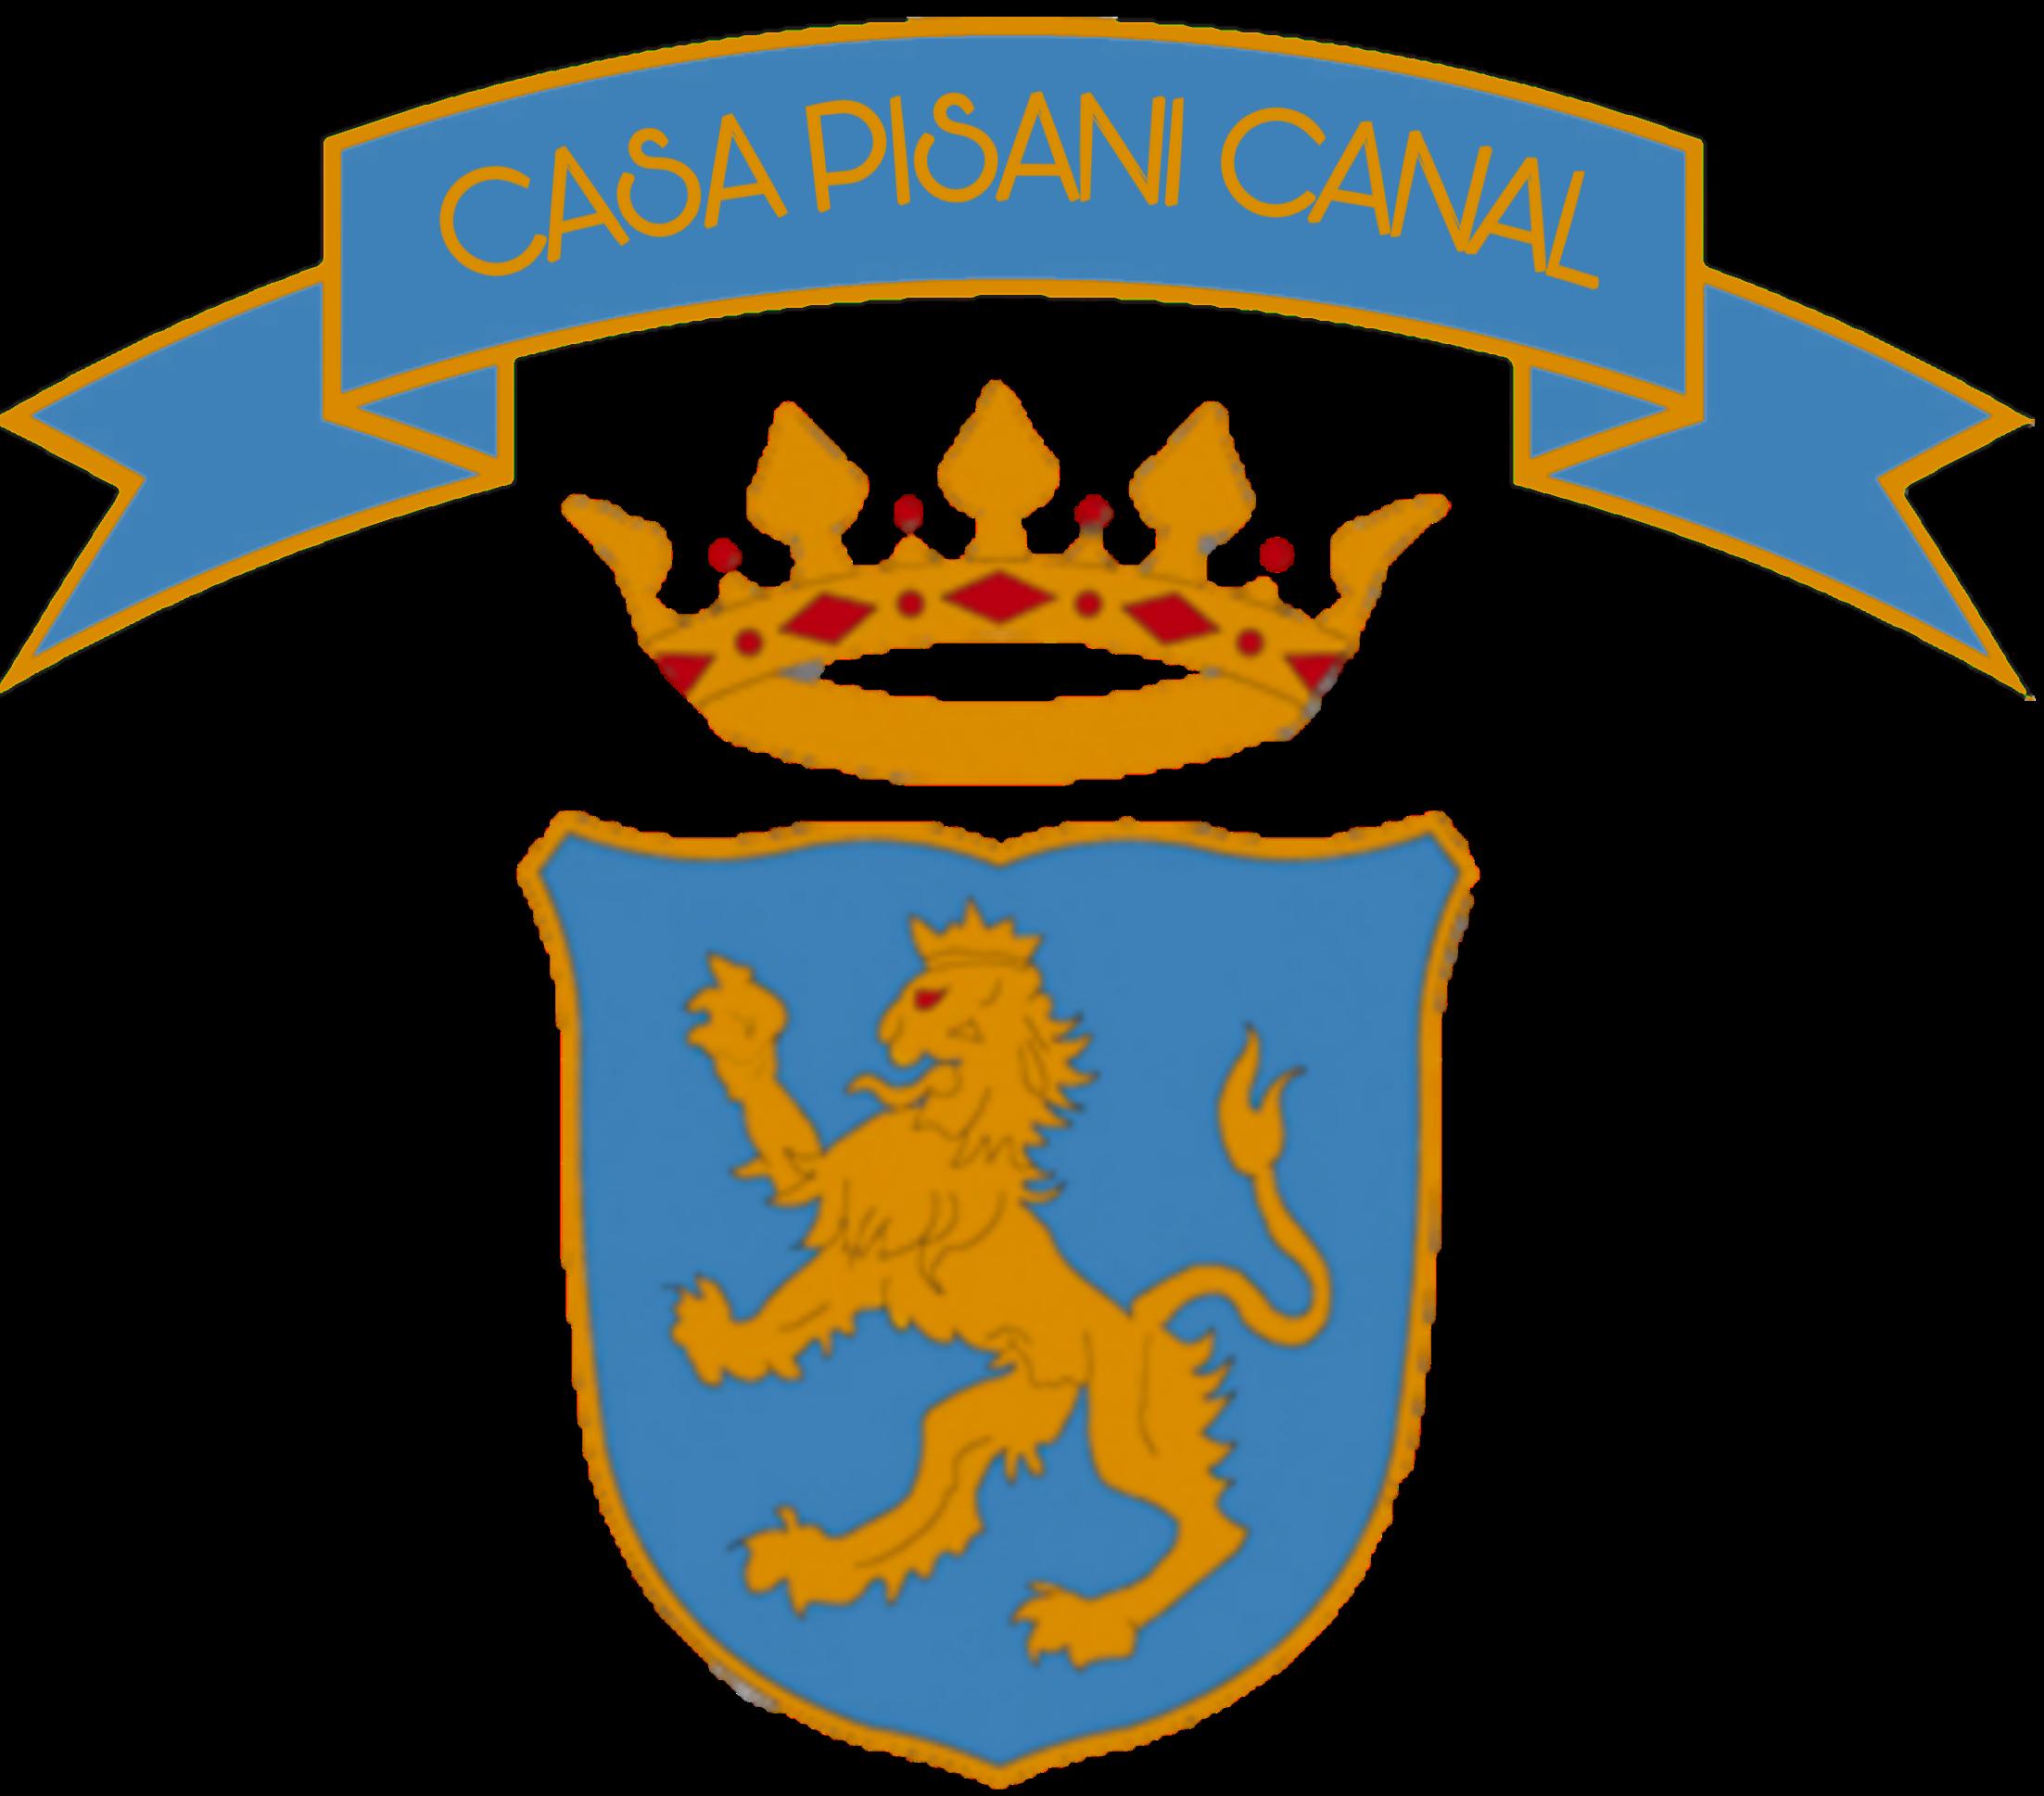 Casa Pisani Canal